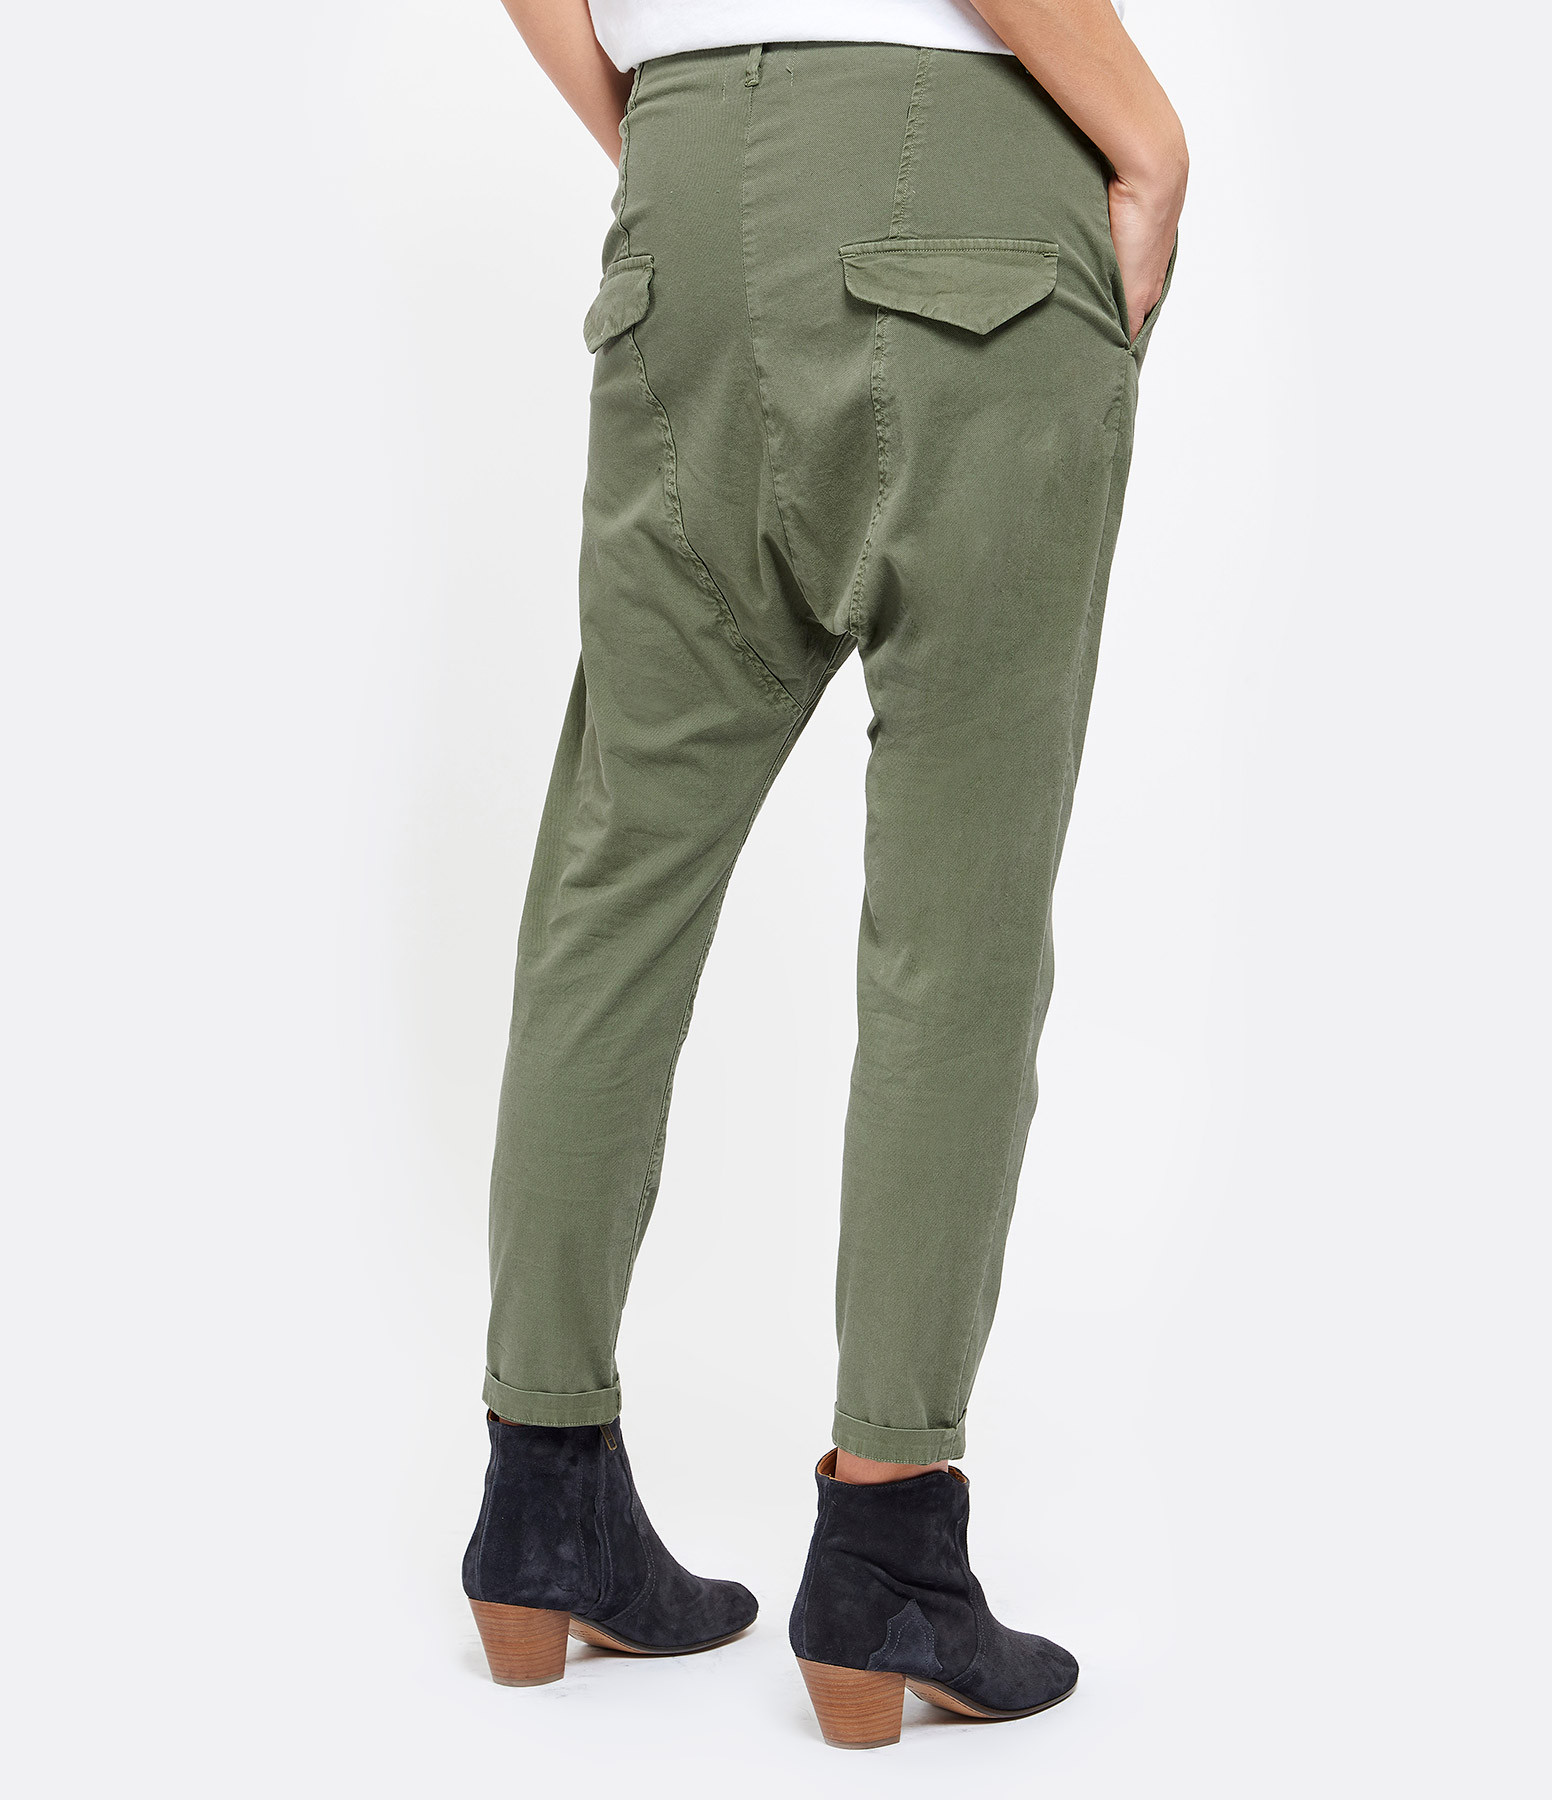 NILI LOTAN - Pantalon Paris Coton Camouflage